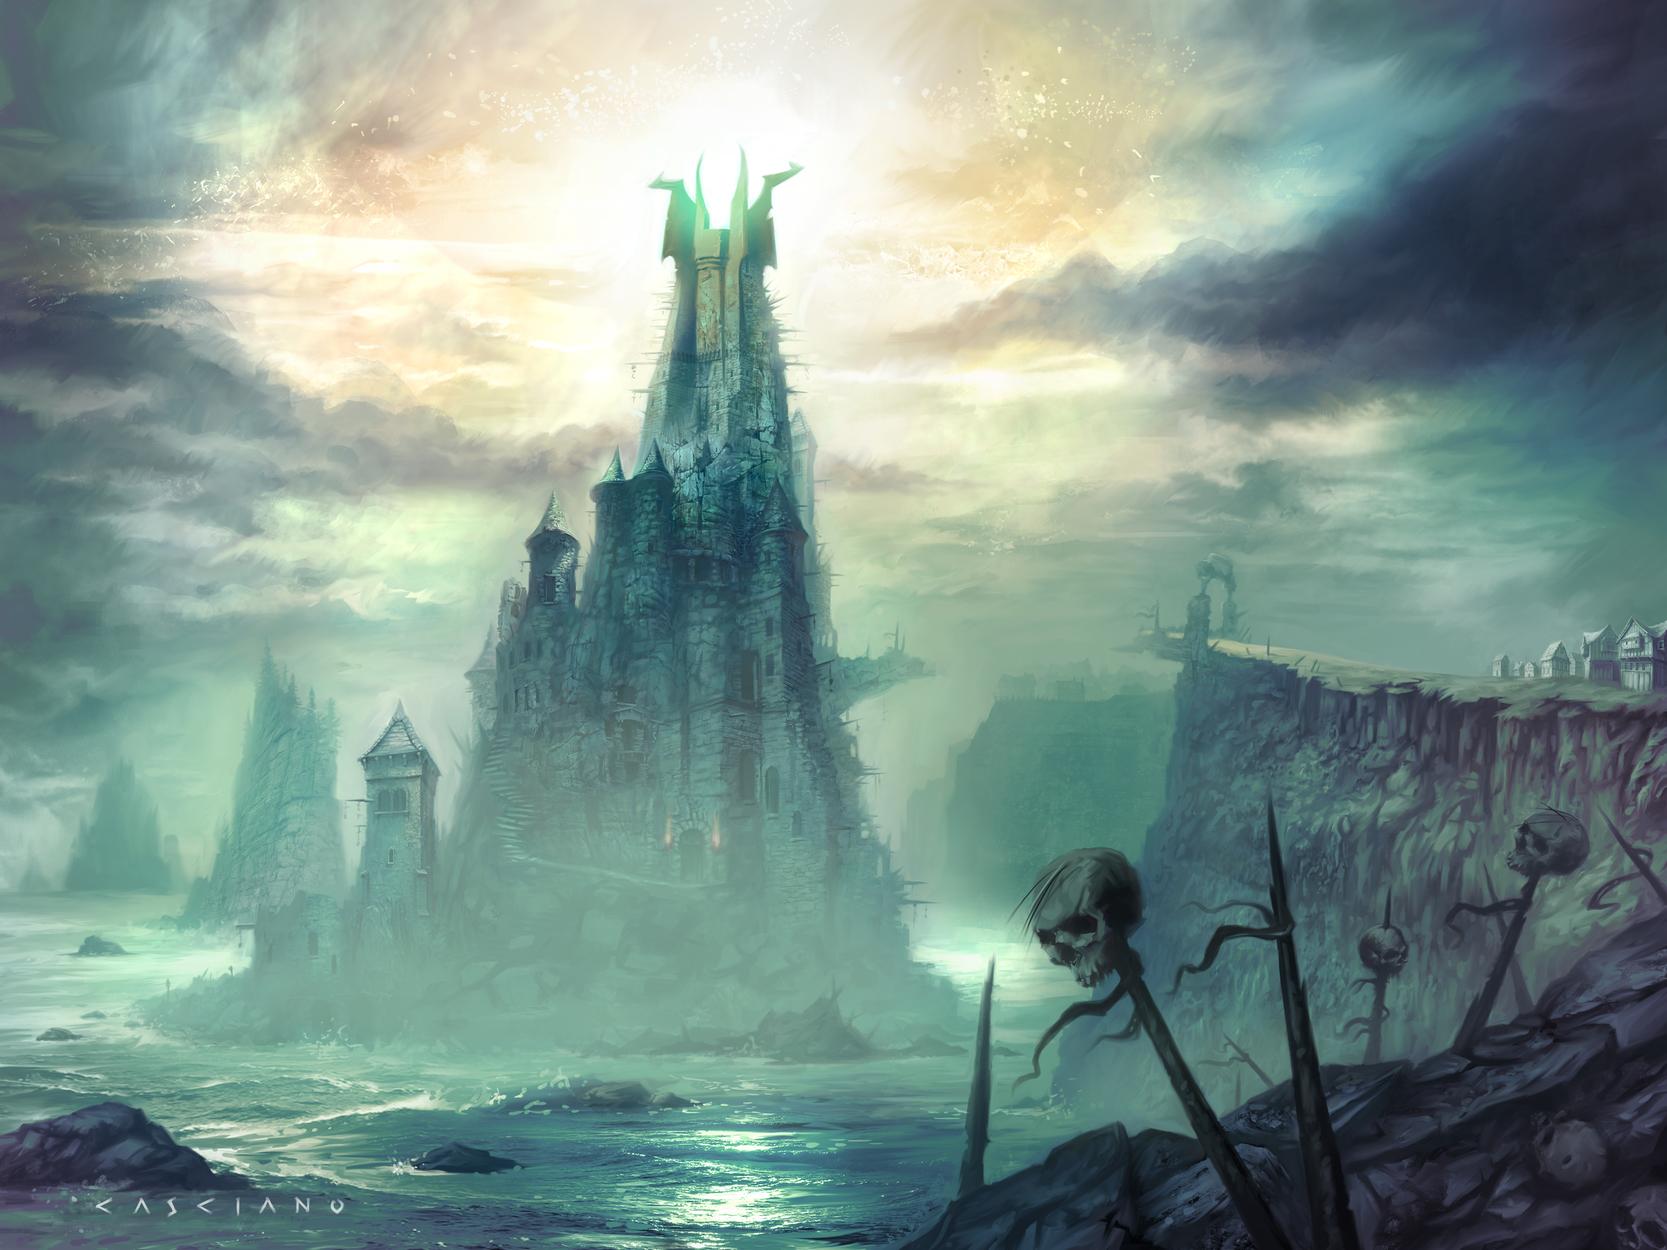 Tower of Tynebris Artwork by Chris Casciano